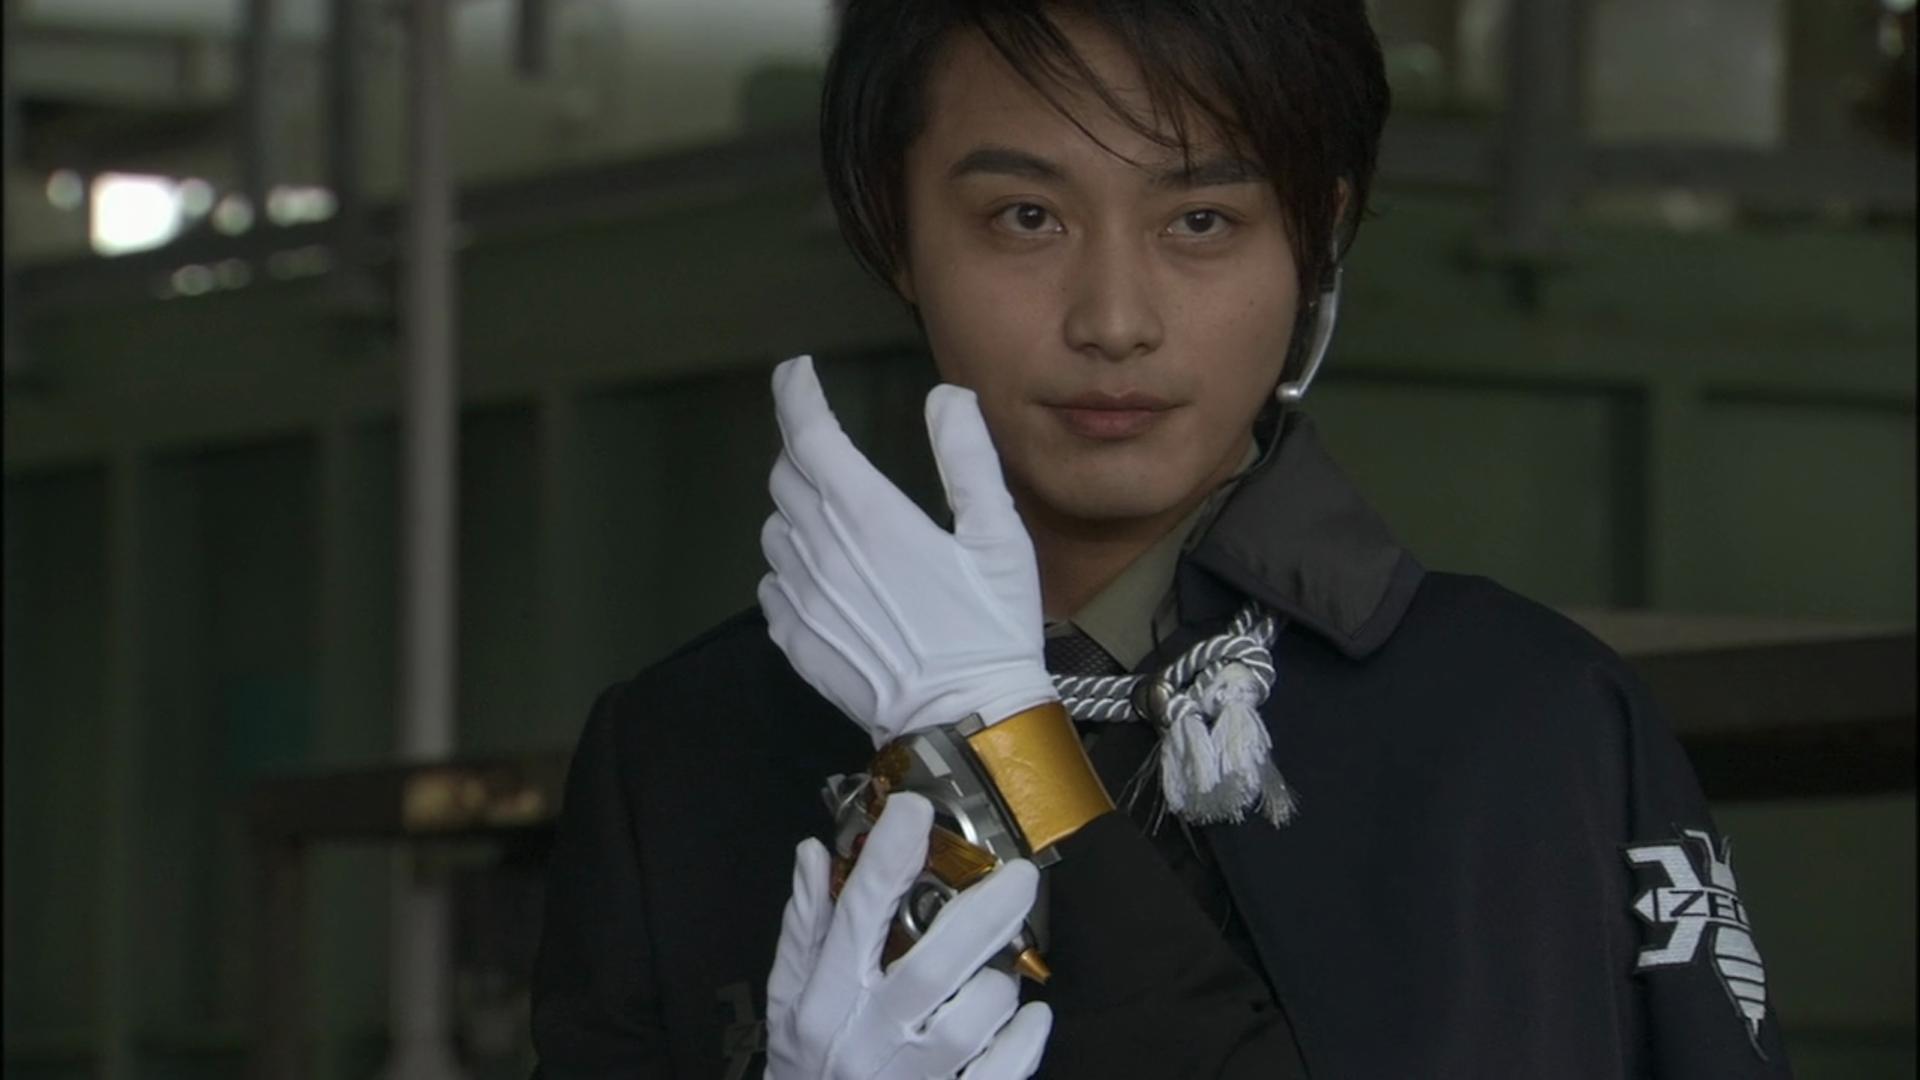 So Yaguruma/God Speed Love